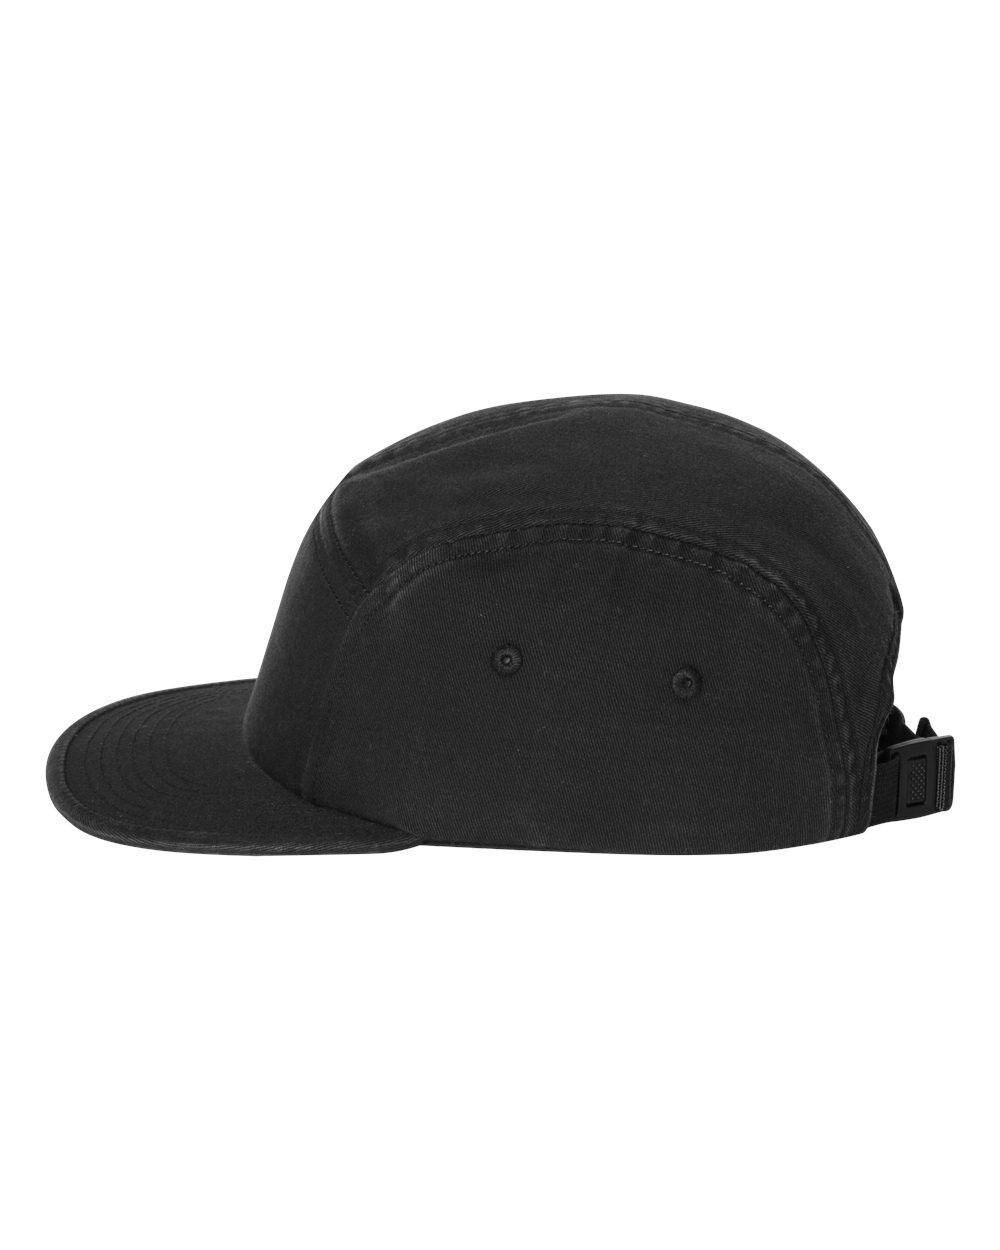 Alternative Jockey Flat Bill Cap 100% cotton panel Unisex Outdoorsman Hat  h0085 2683bcf165cf